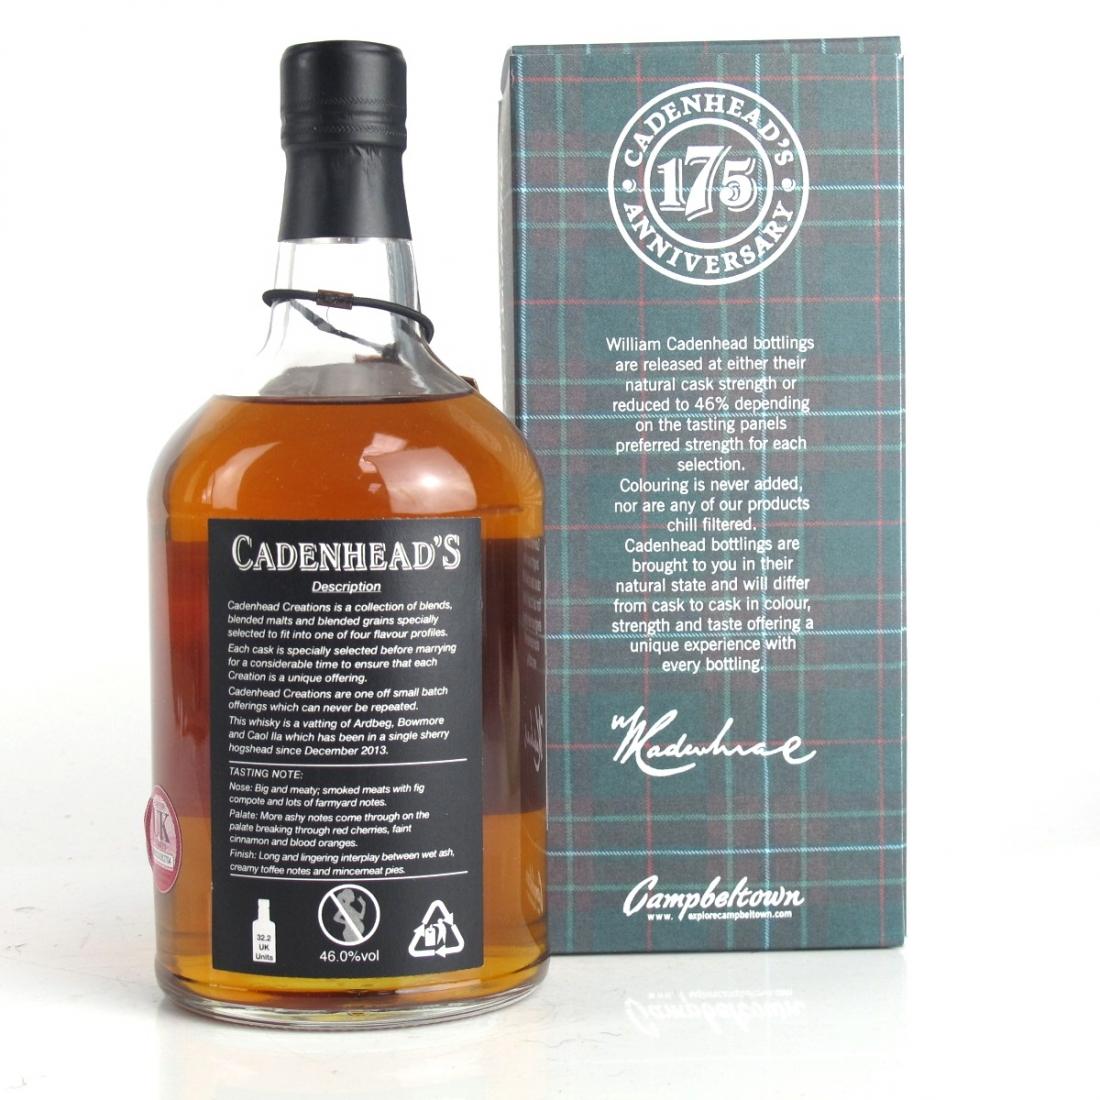 Cadenhead Creations 25 Year Old Robust Smoky Embers Batch #3